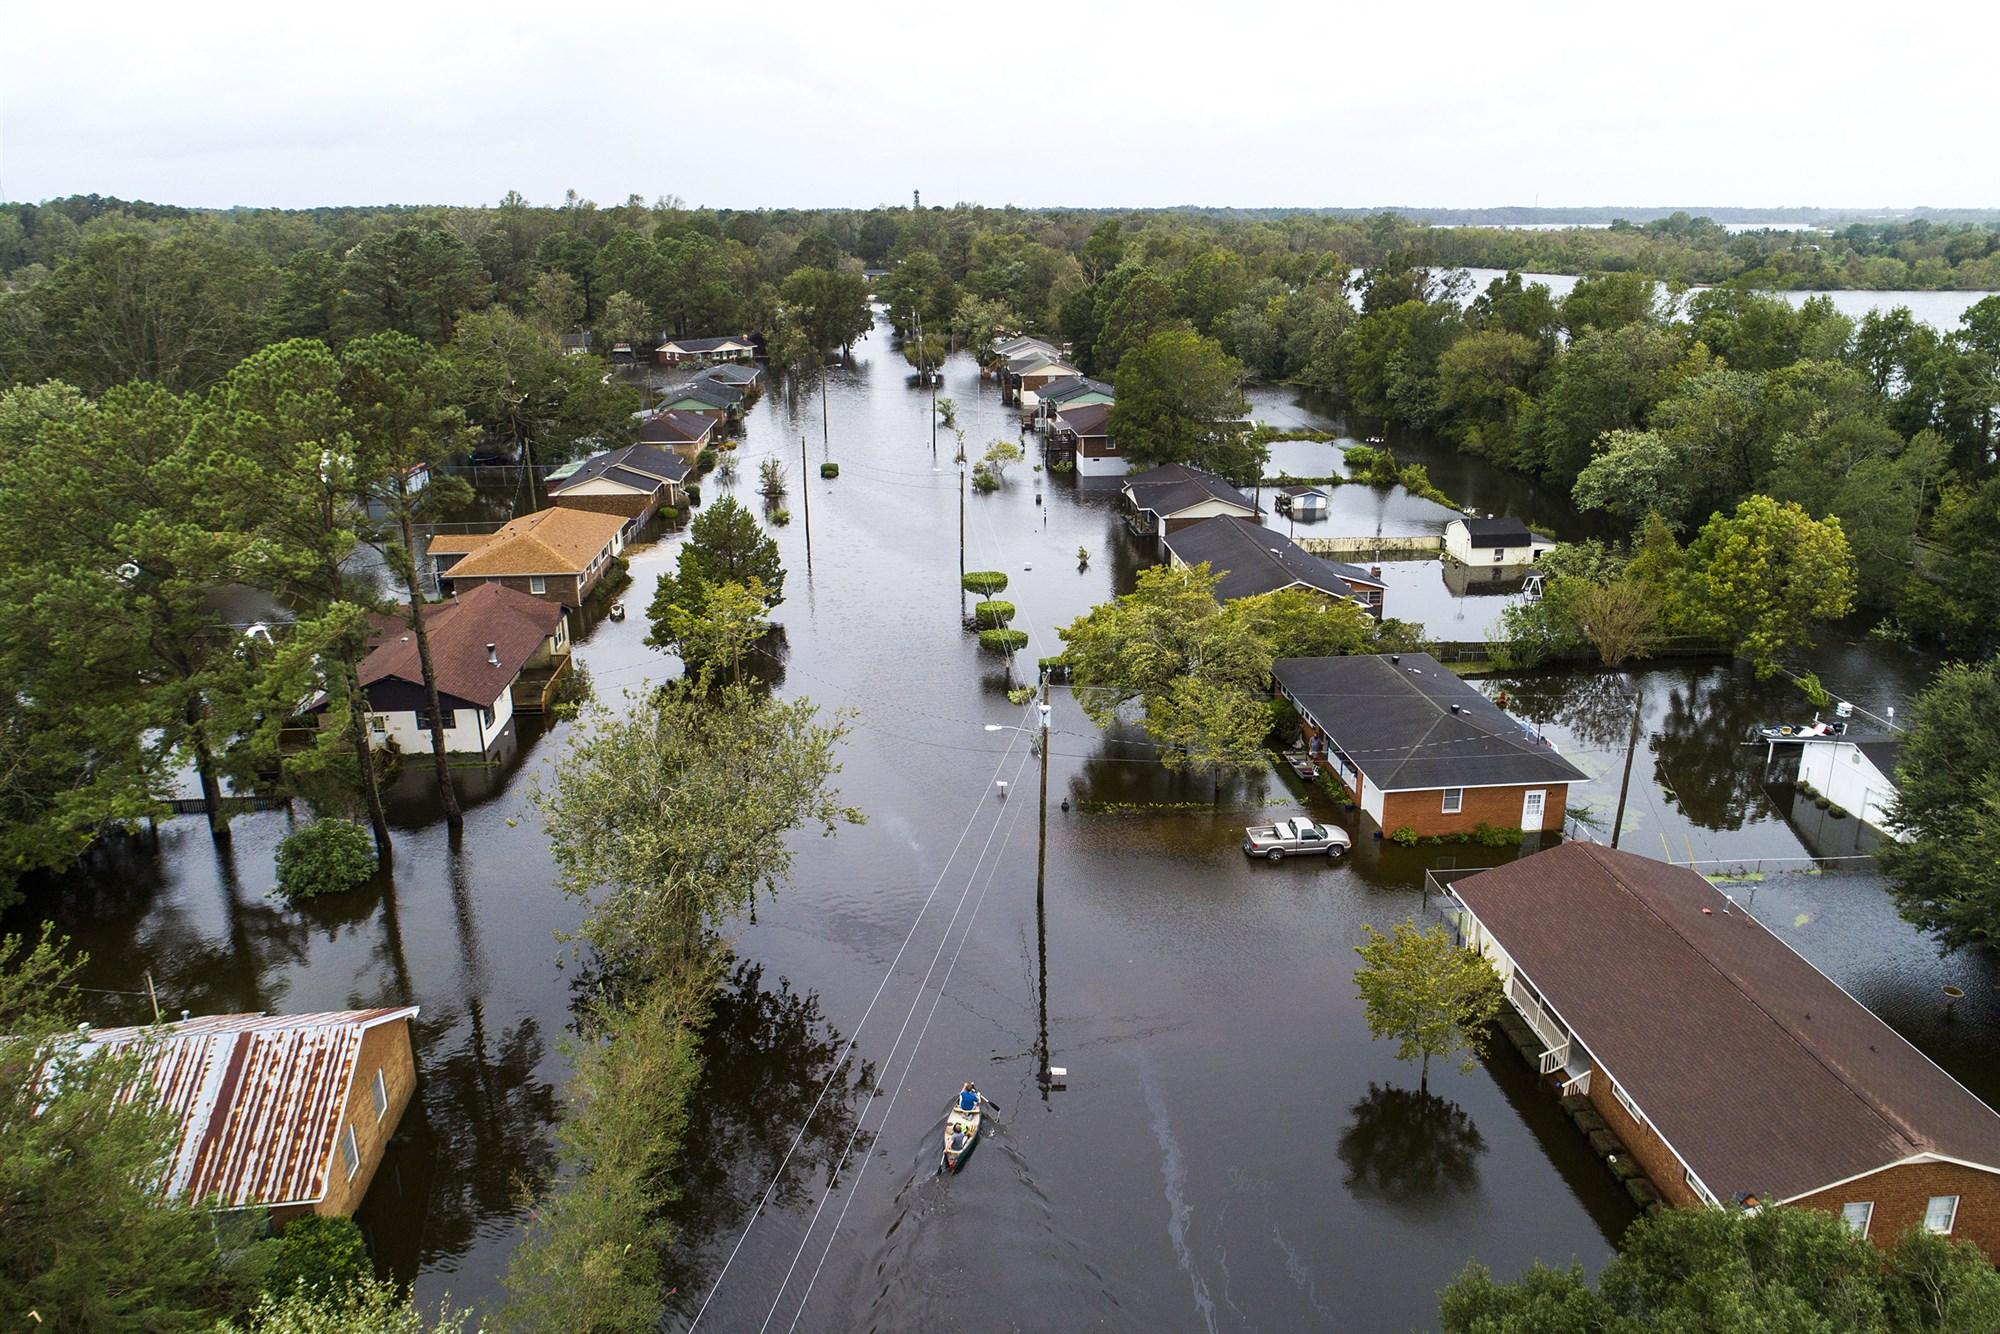 New Bern flooding